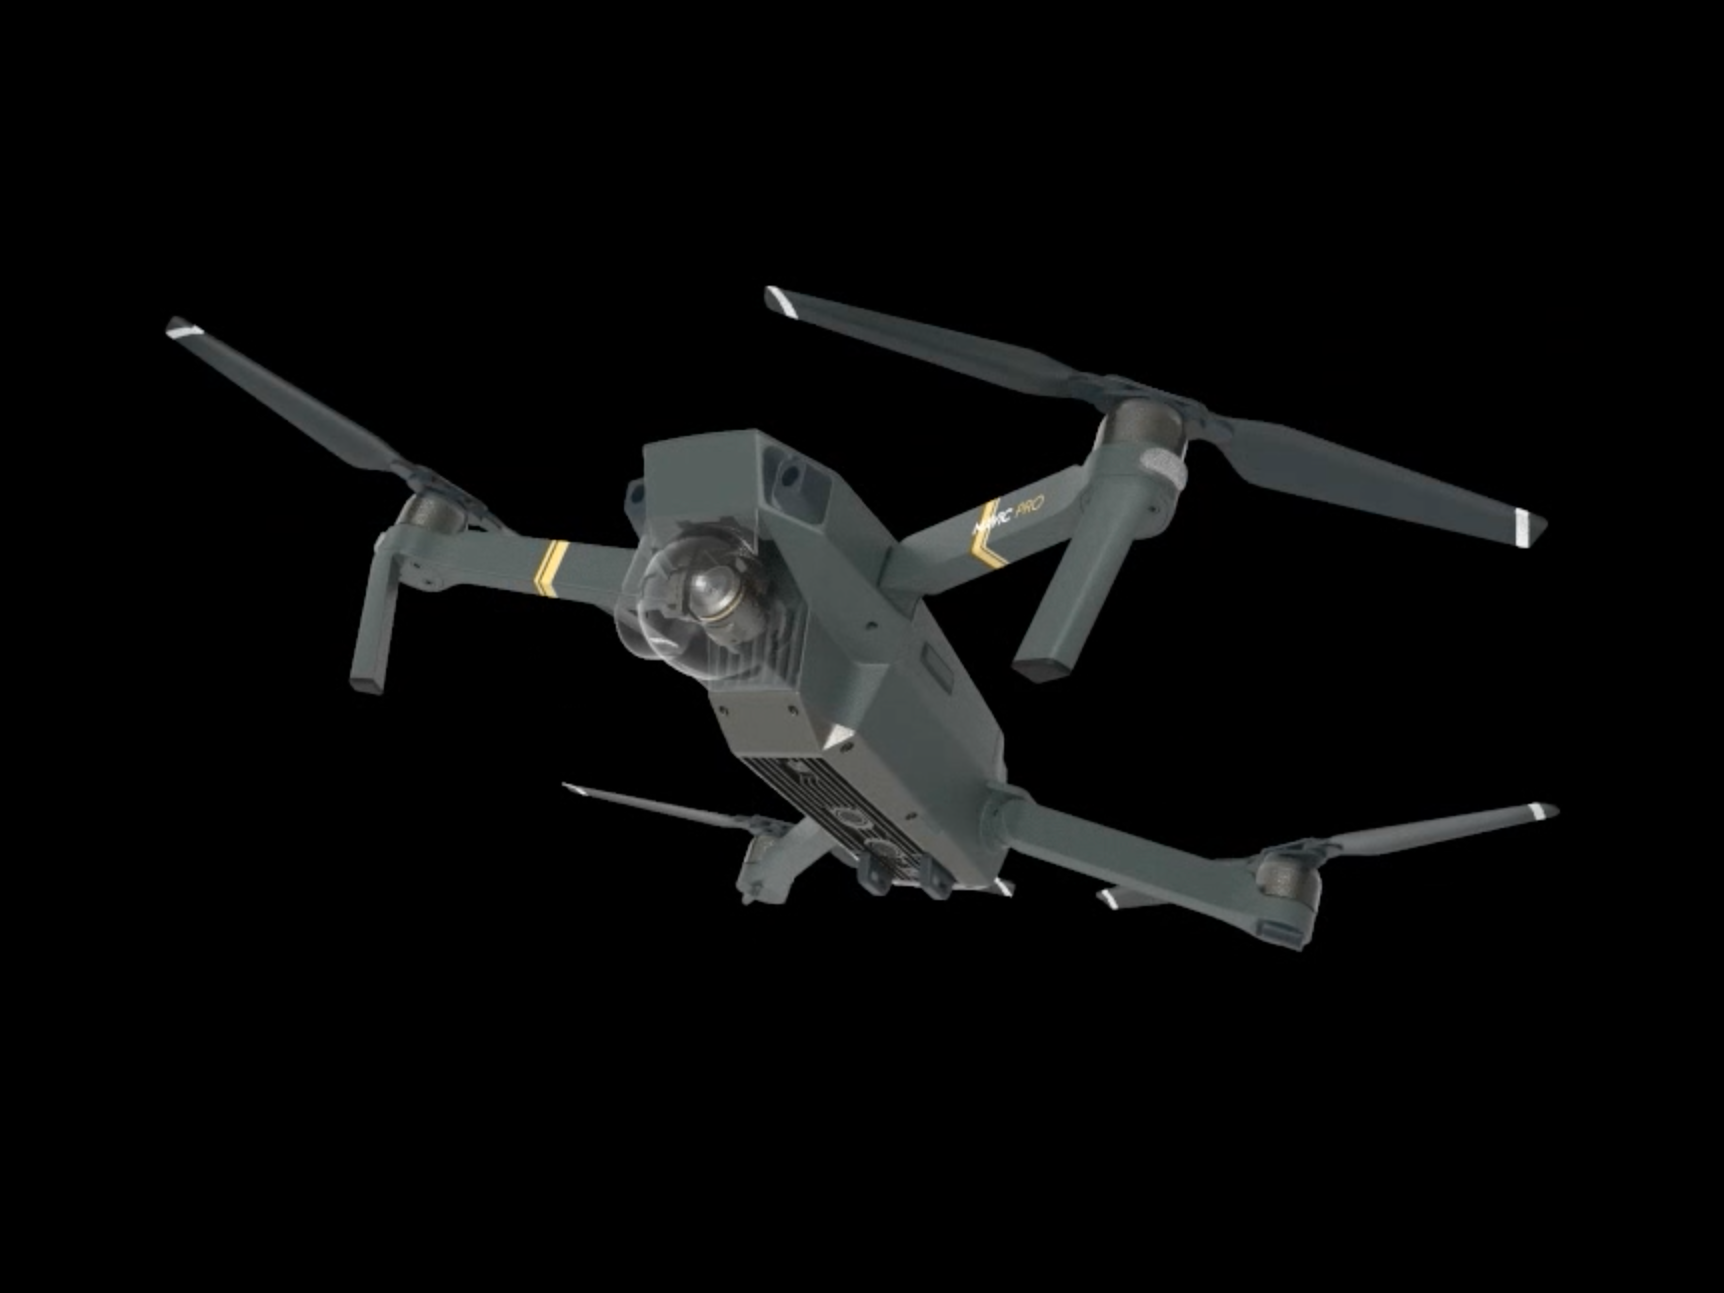 THE LOOP / DUTY FREE | DRONE